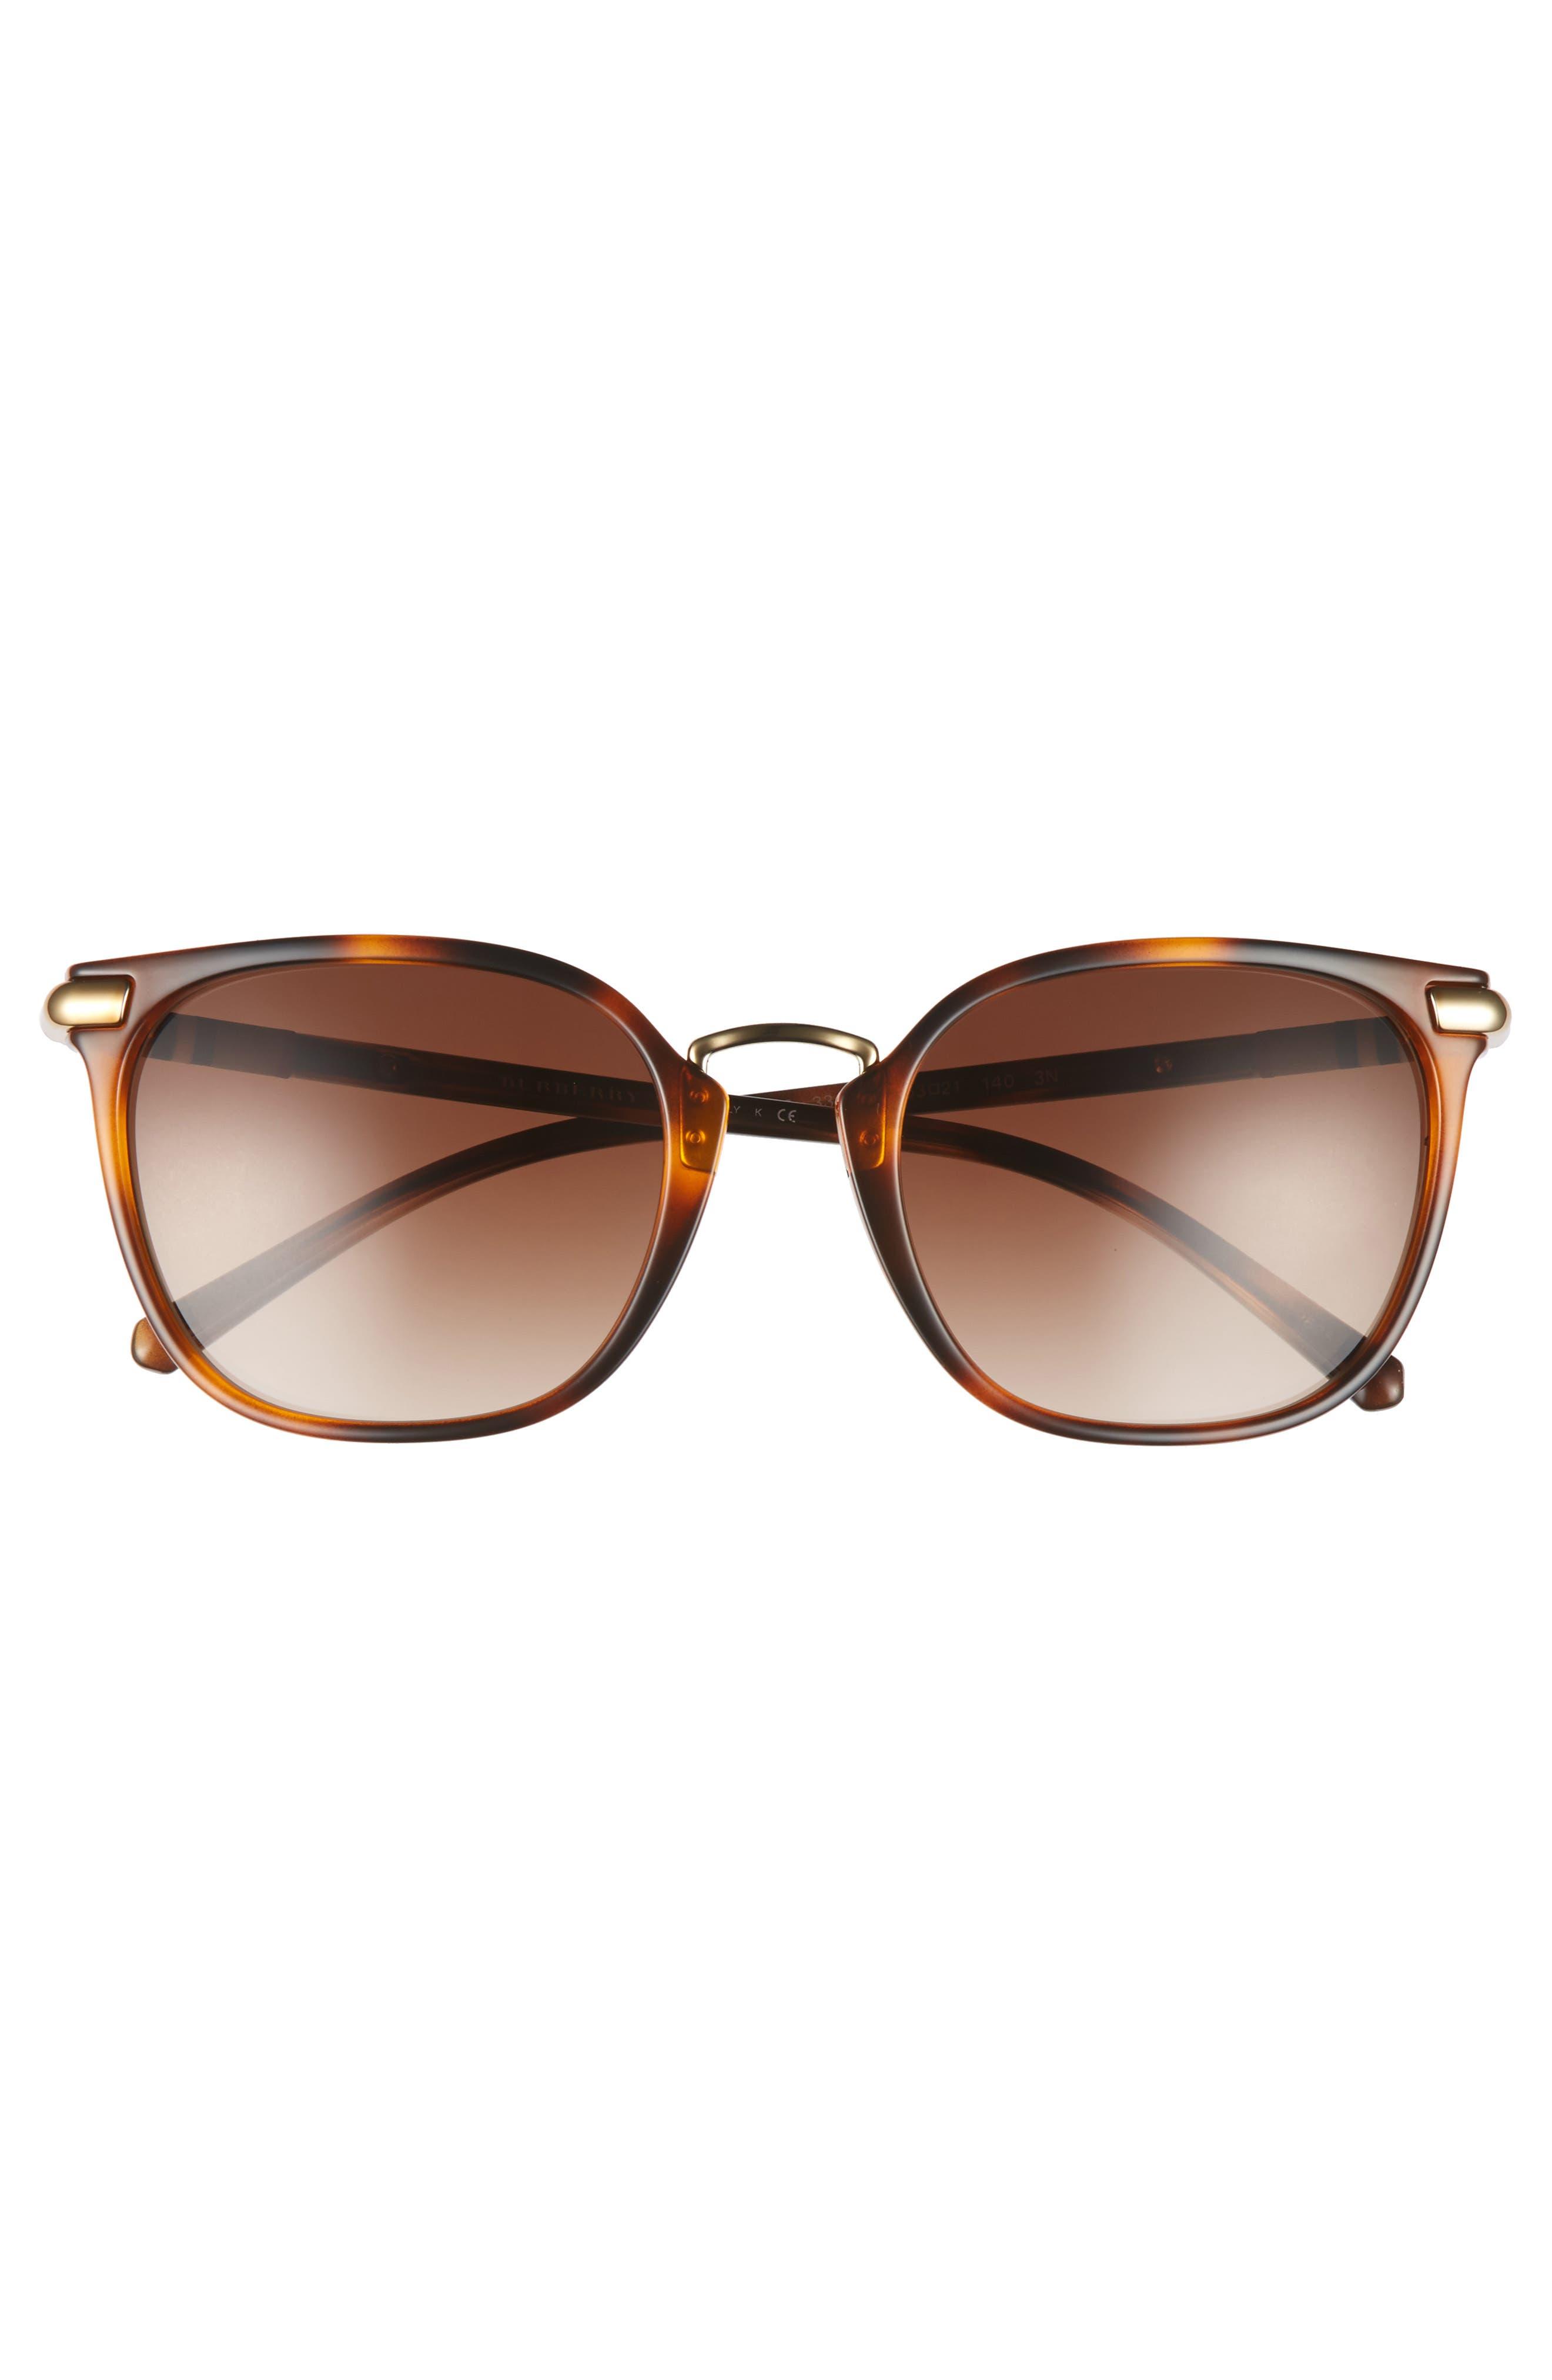 53mm Gradient Square Sunglasses,                             Alternate thumbnail 11, color,